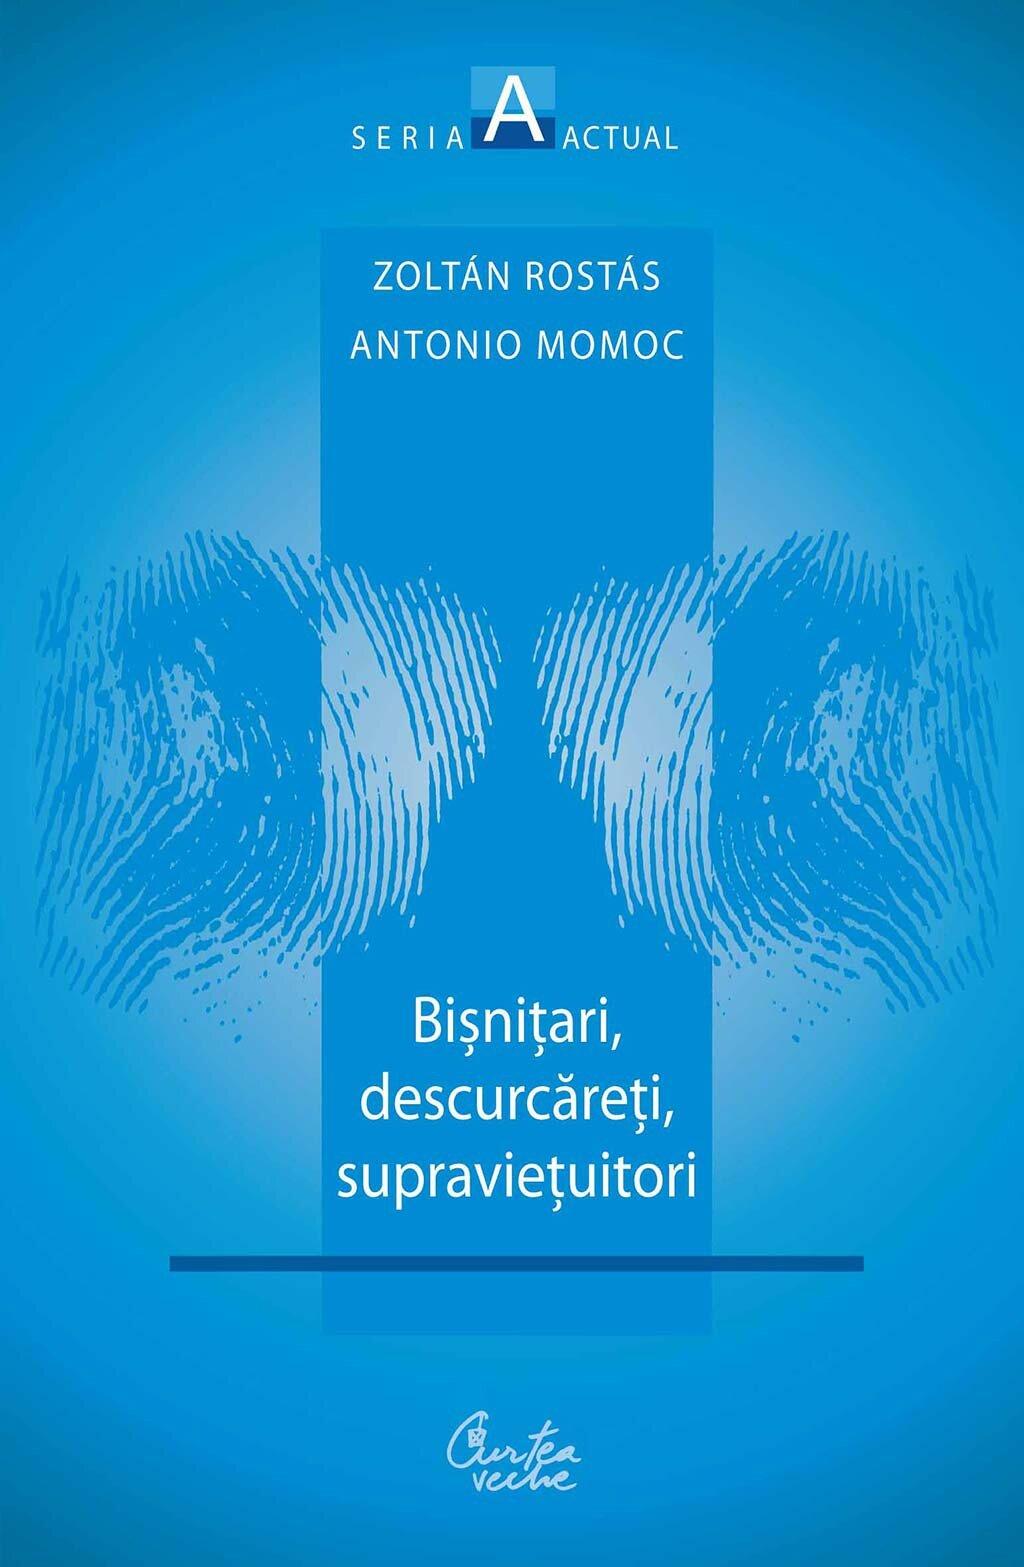 Bisnitari, descurcareti, supravietuitori PDF (Download eBook)